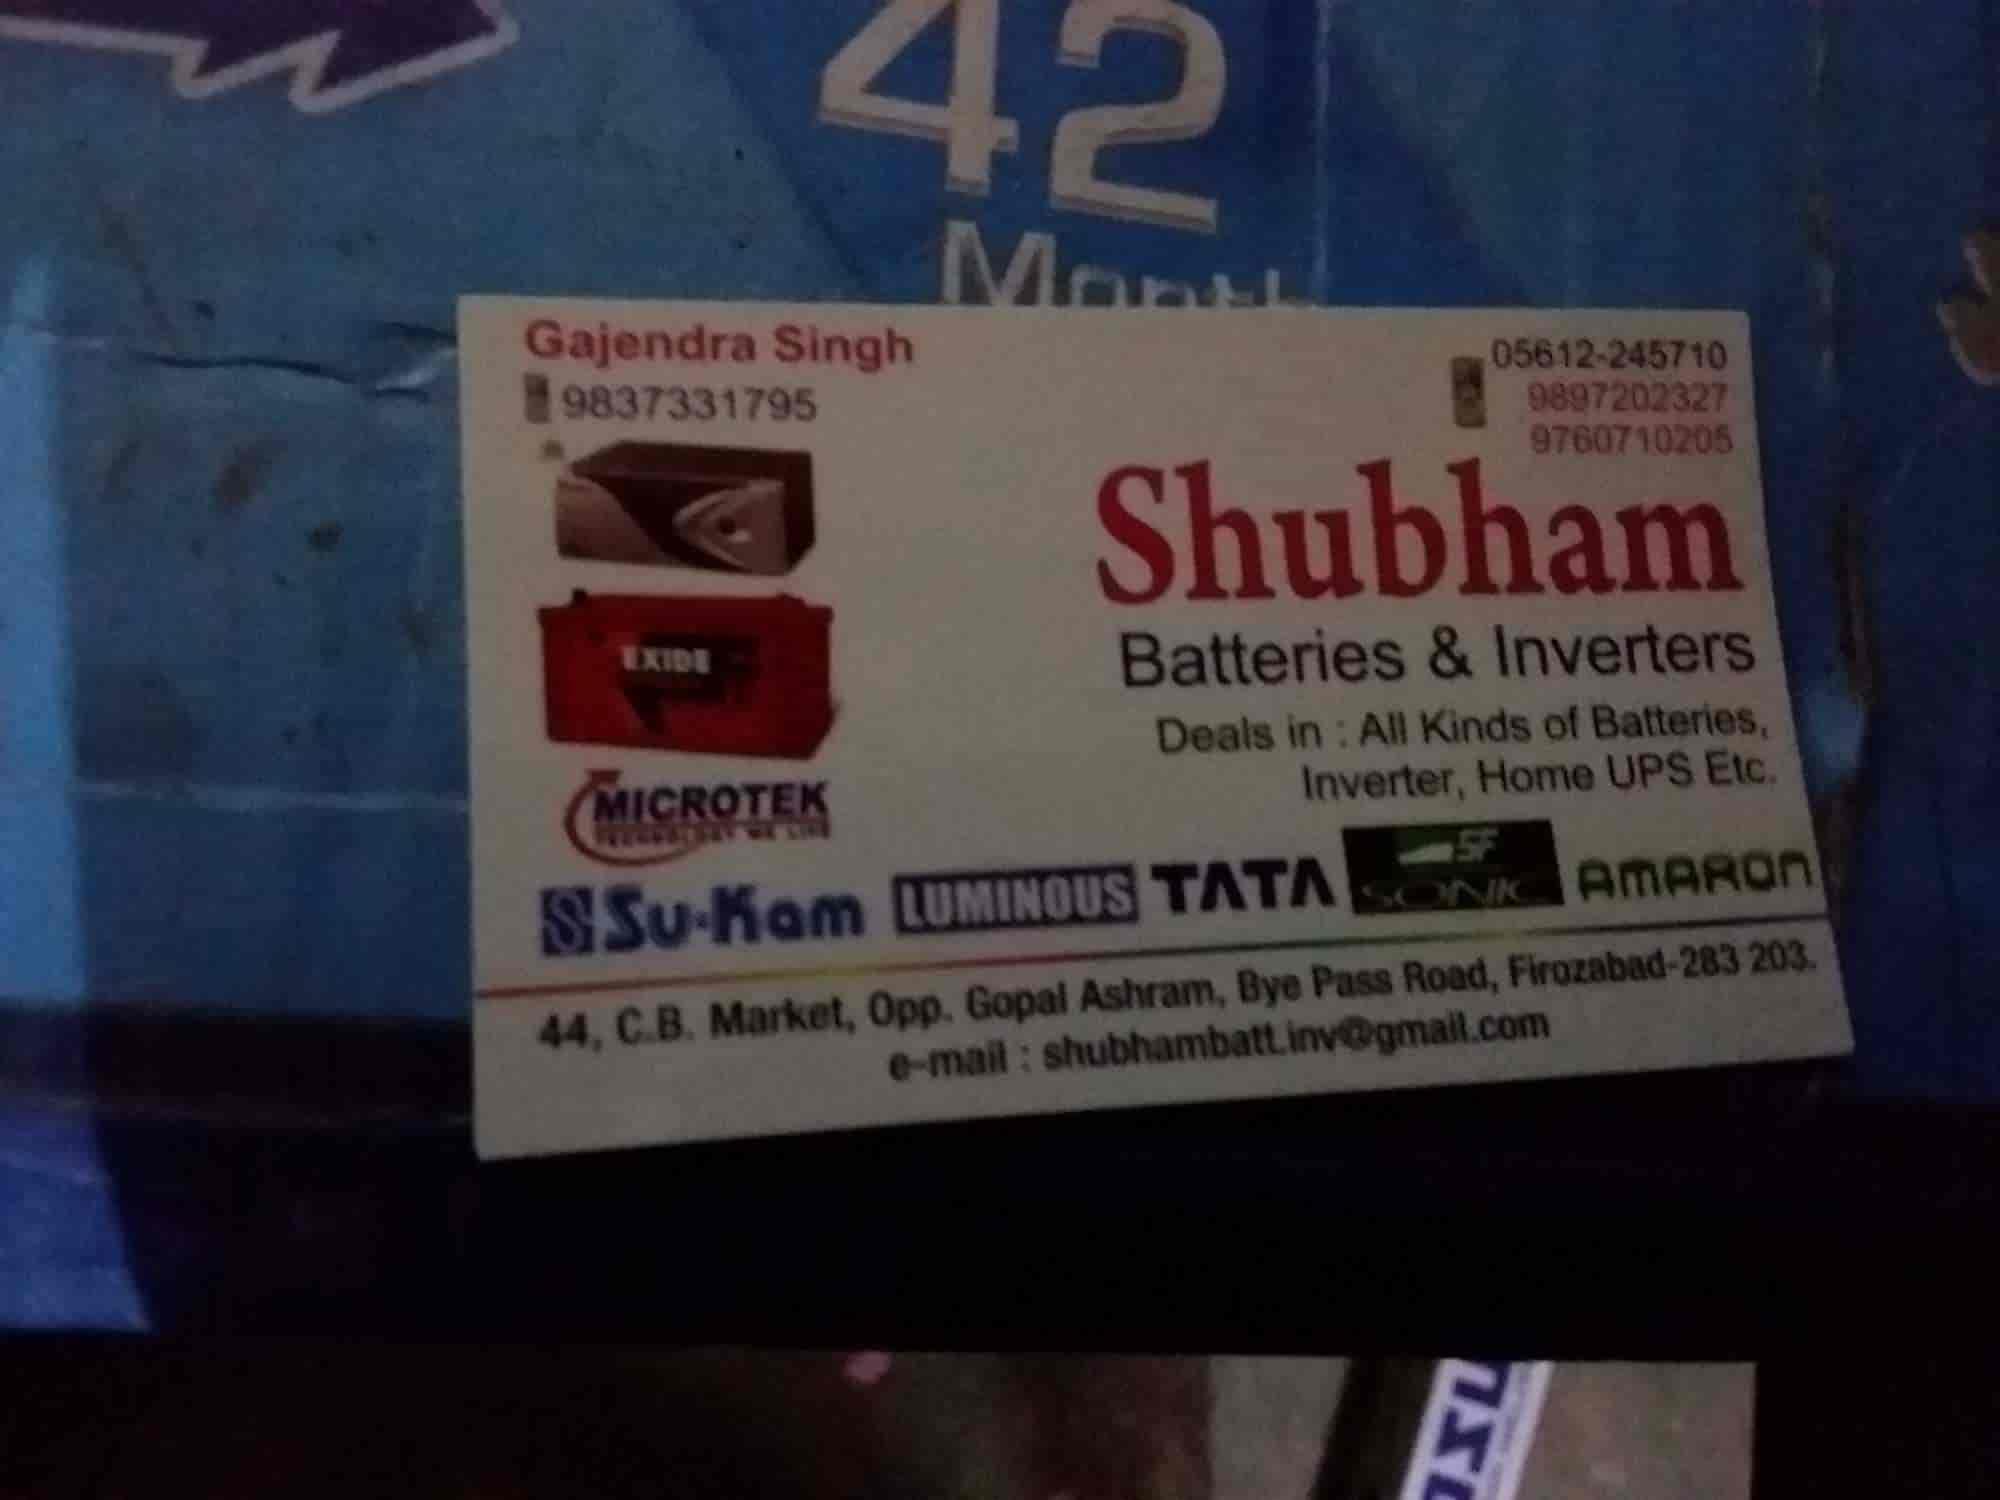 Shubham Batteries & Inverters, Akalabad Hasanpur